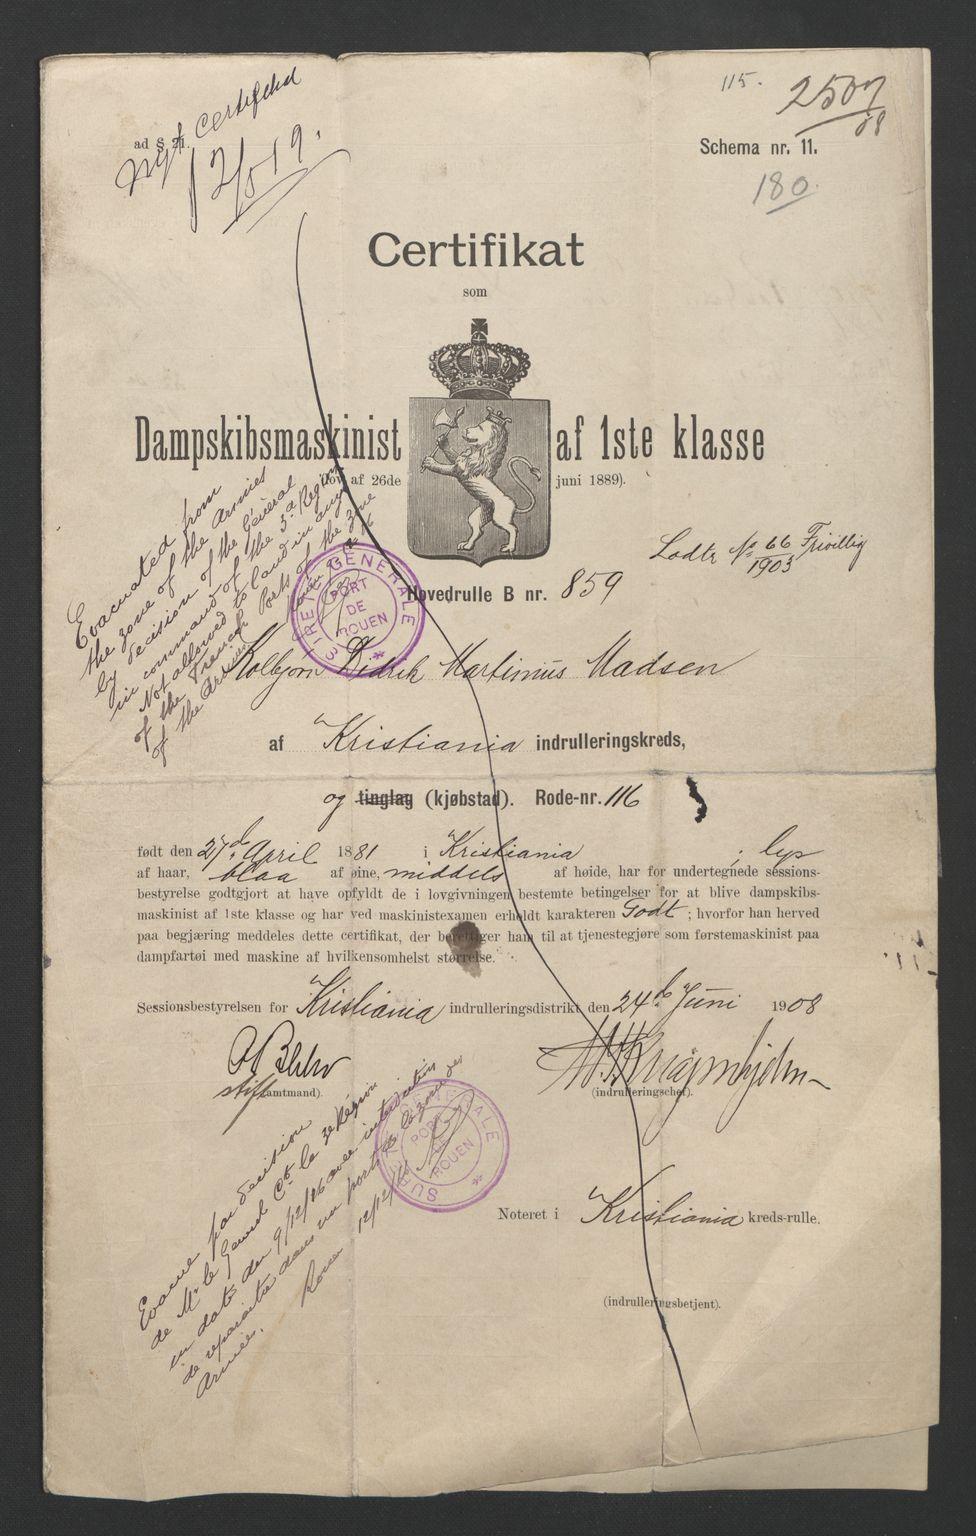 SAO, Oslo sjømannskontor, F/Fd/L0001: B-rulle, 1891-1906, s. 673-674